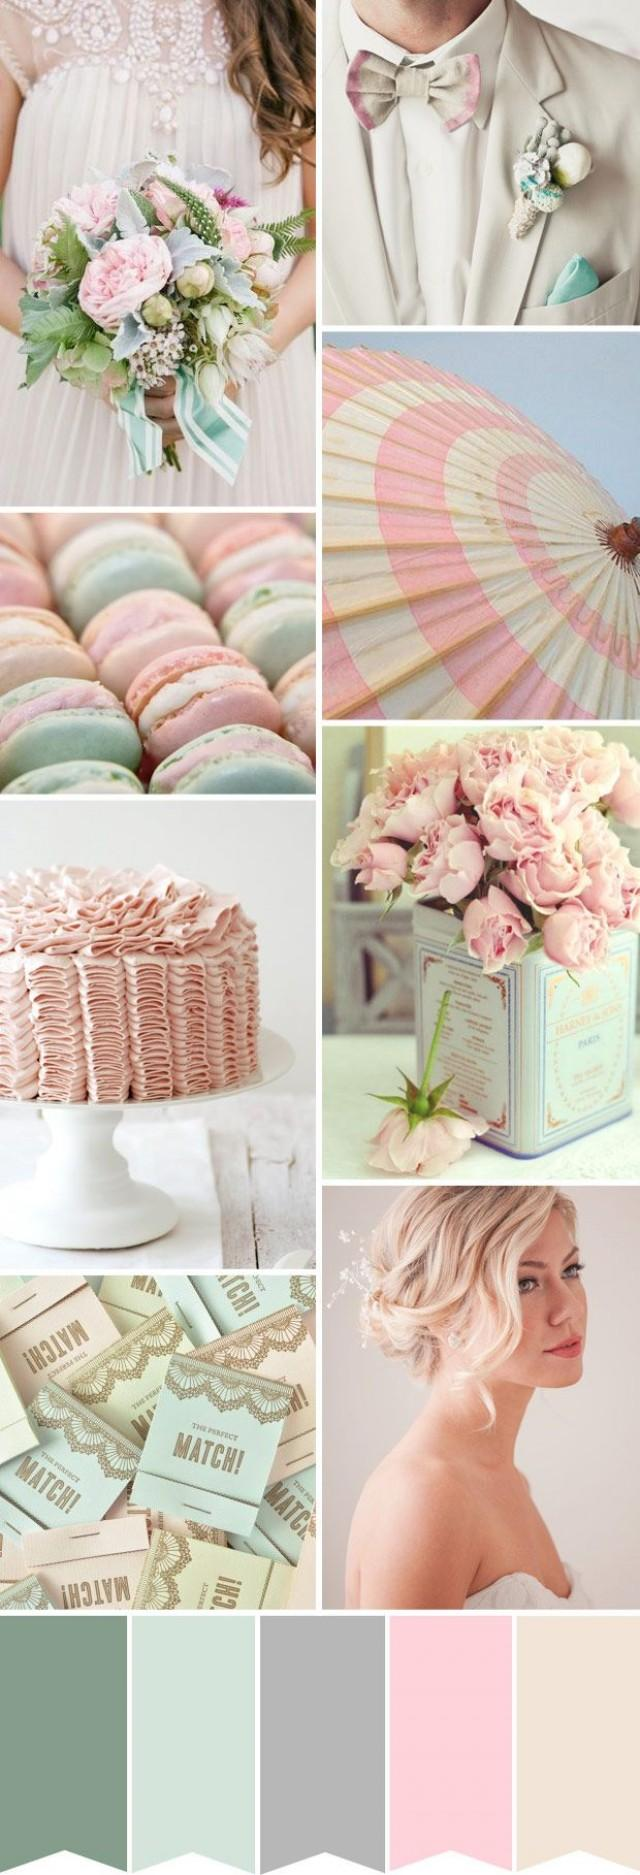 Цветовые палитры для свадьбы фото